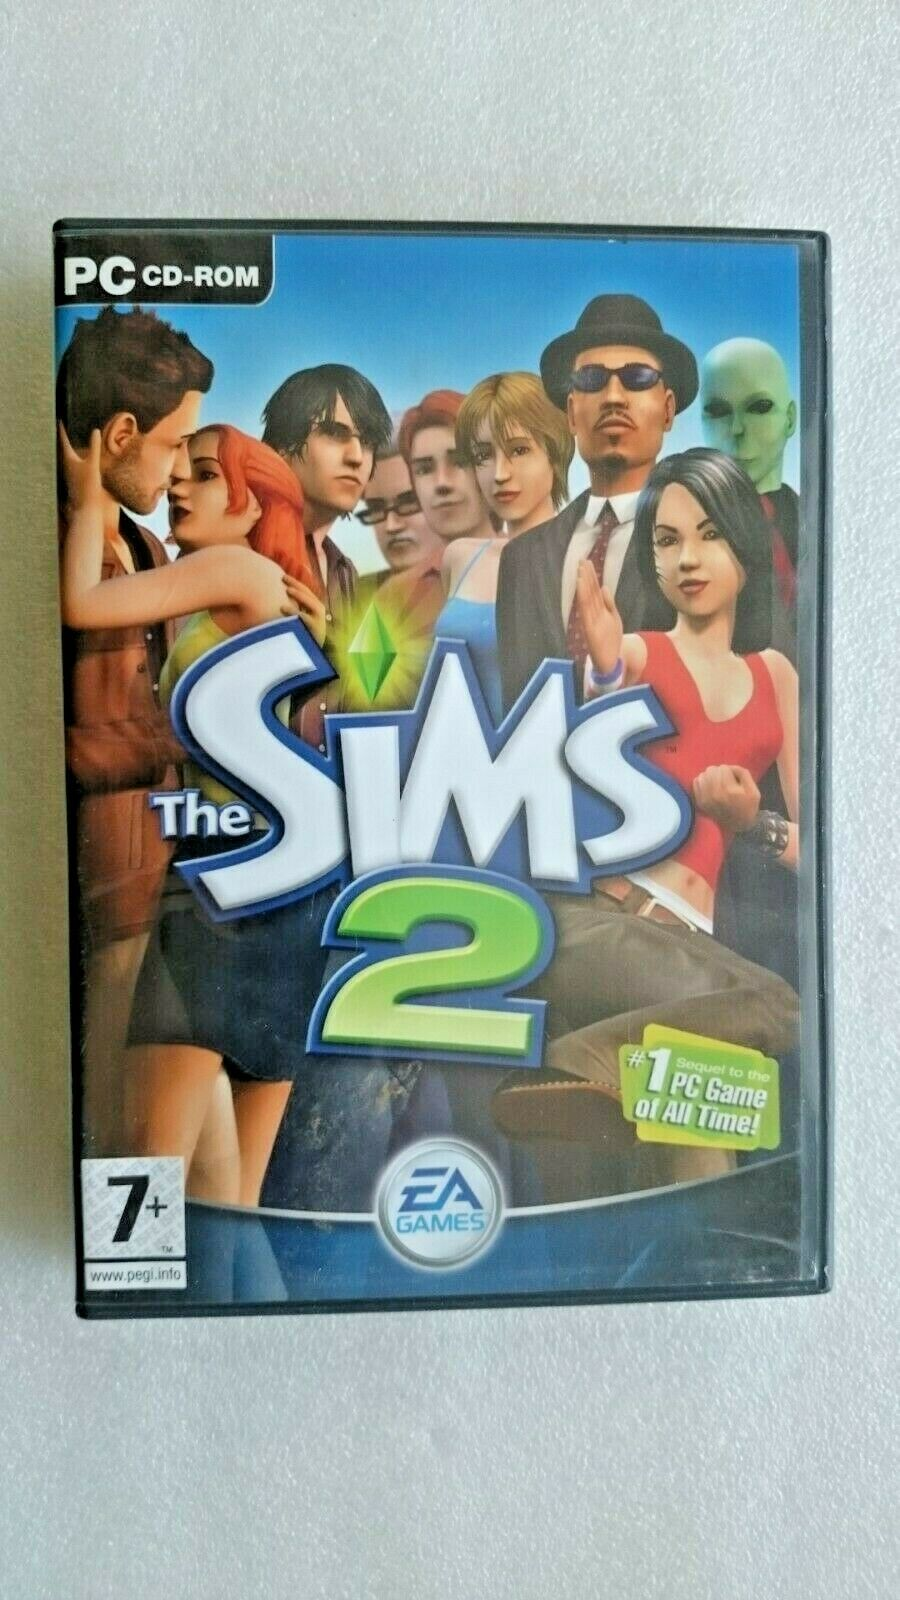 The Sims 2 (PC: Windows, 2004)